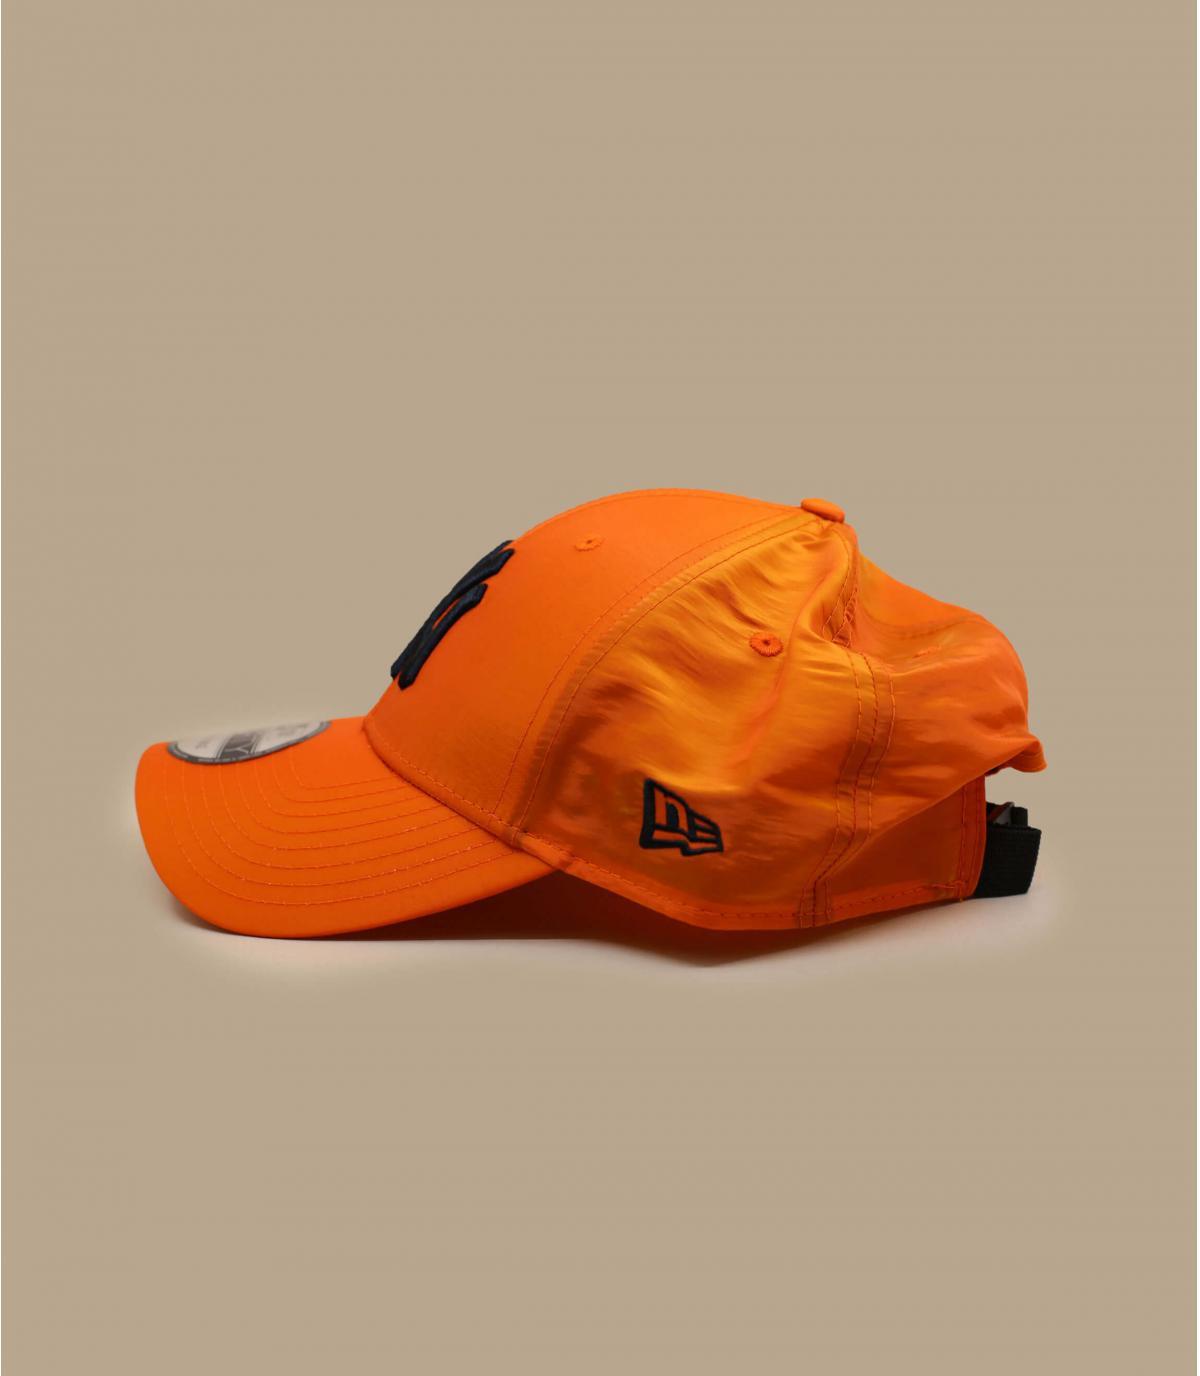 Details Hypertone NY 940 orange - Abbildung 2